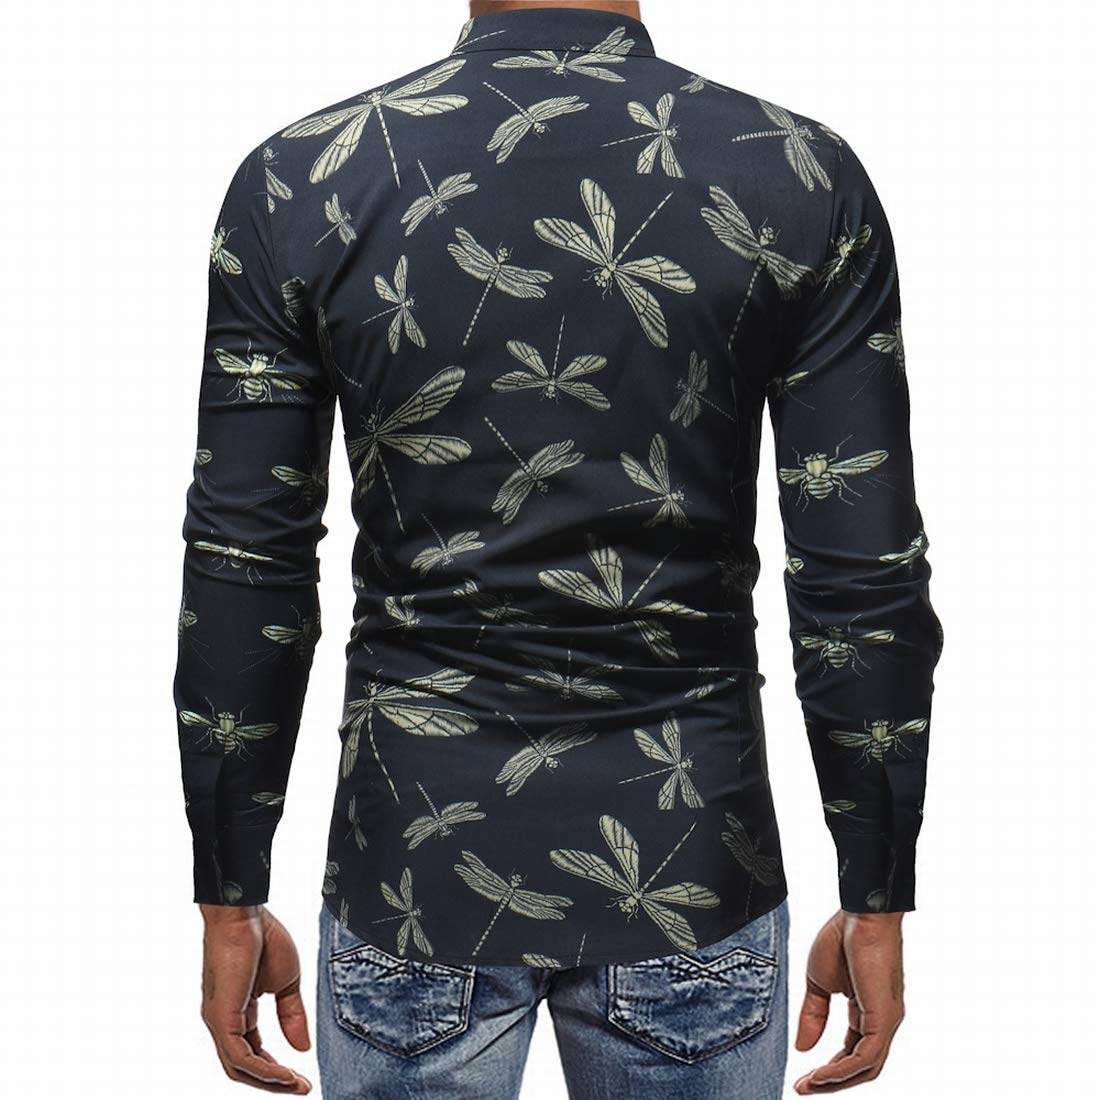 Nanquan Men Vintage Dragonfly Print Long Sleeve Slim Fit Casual Shirt